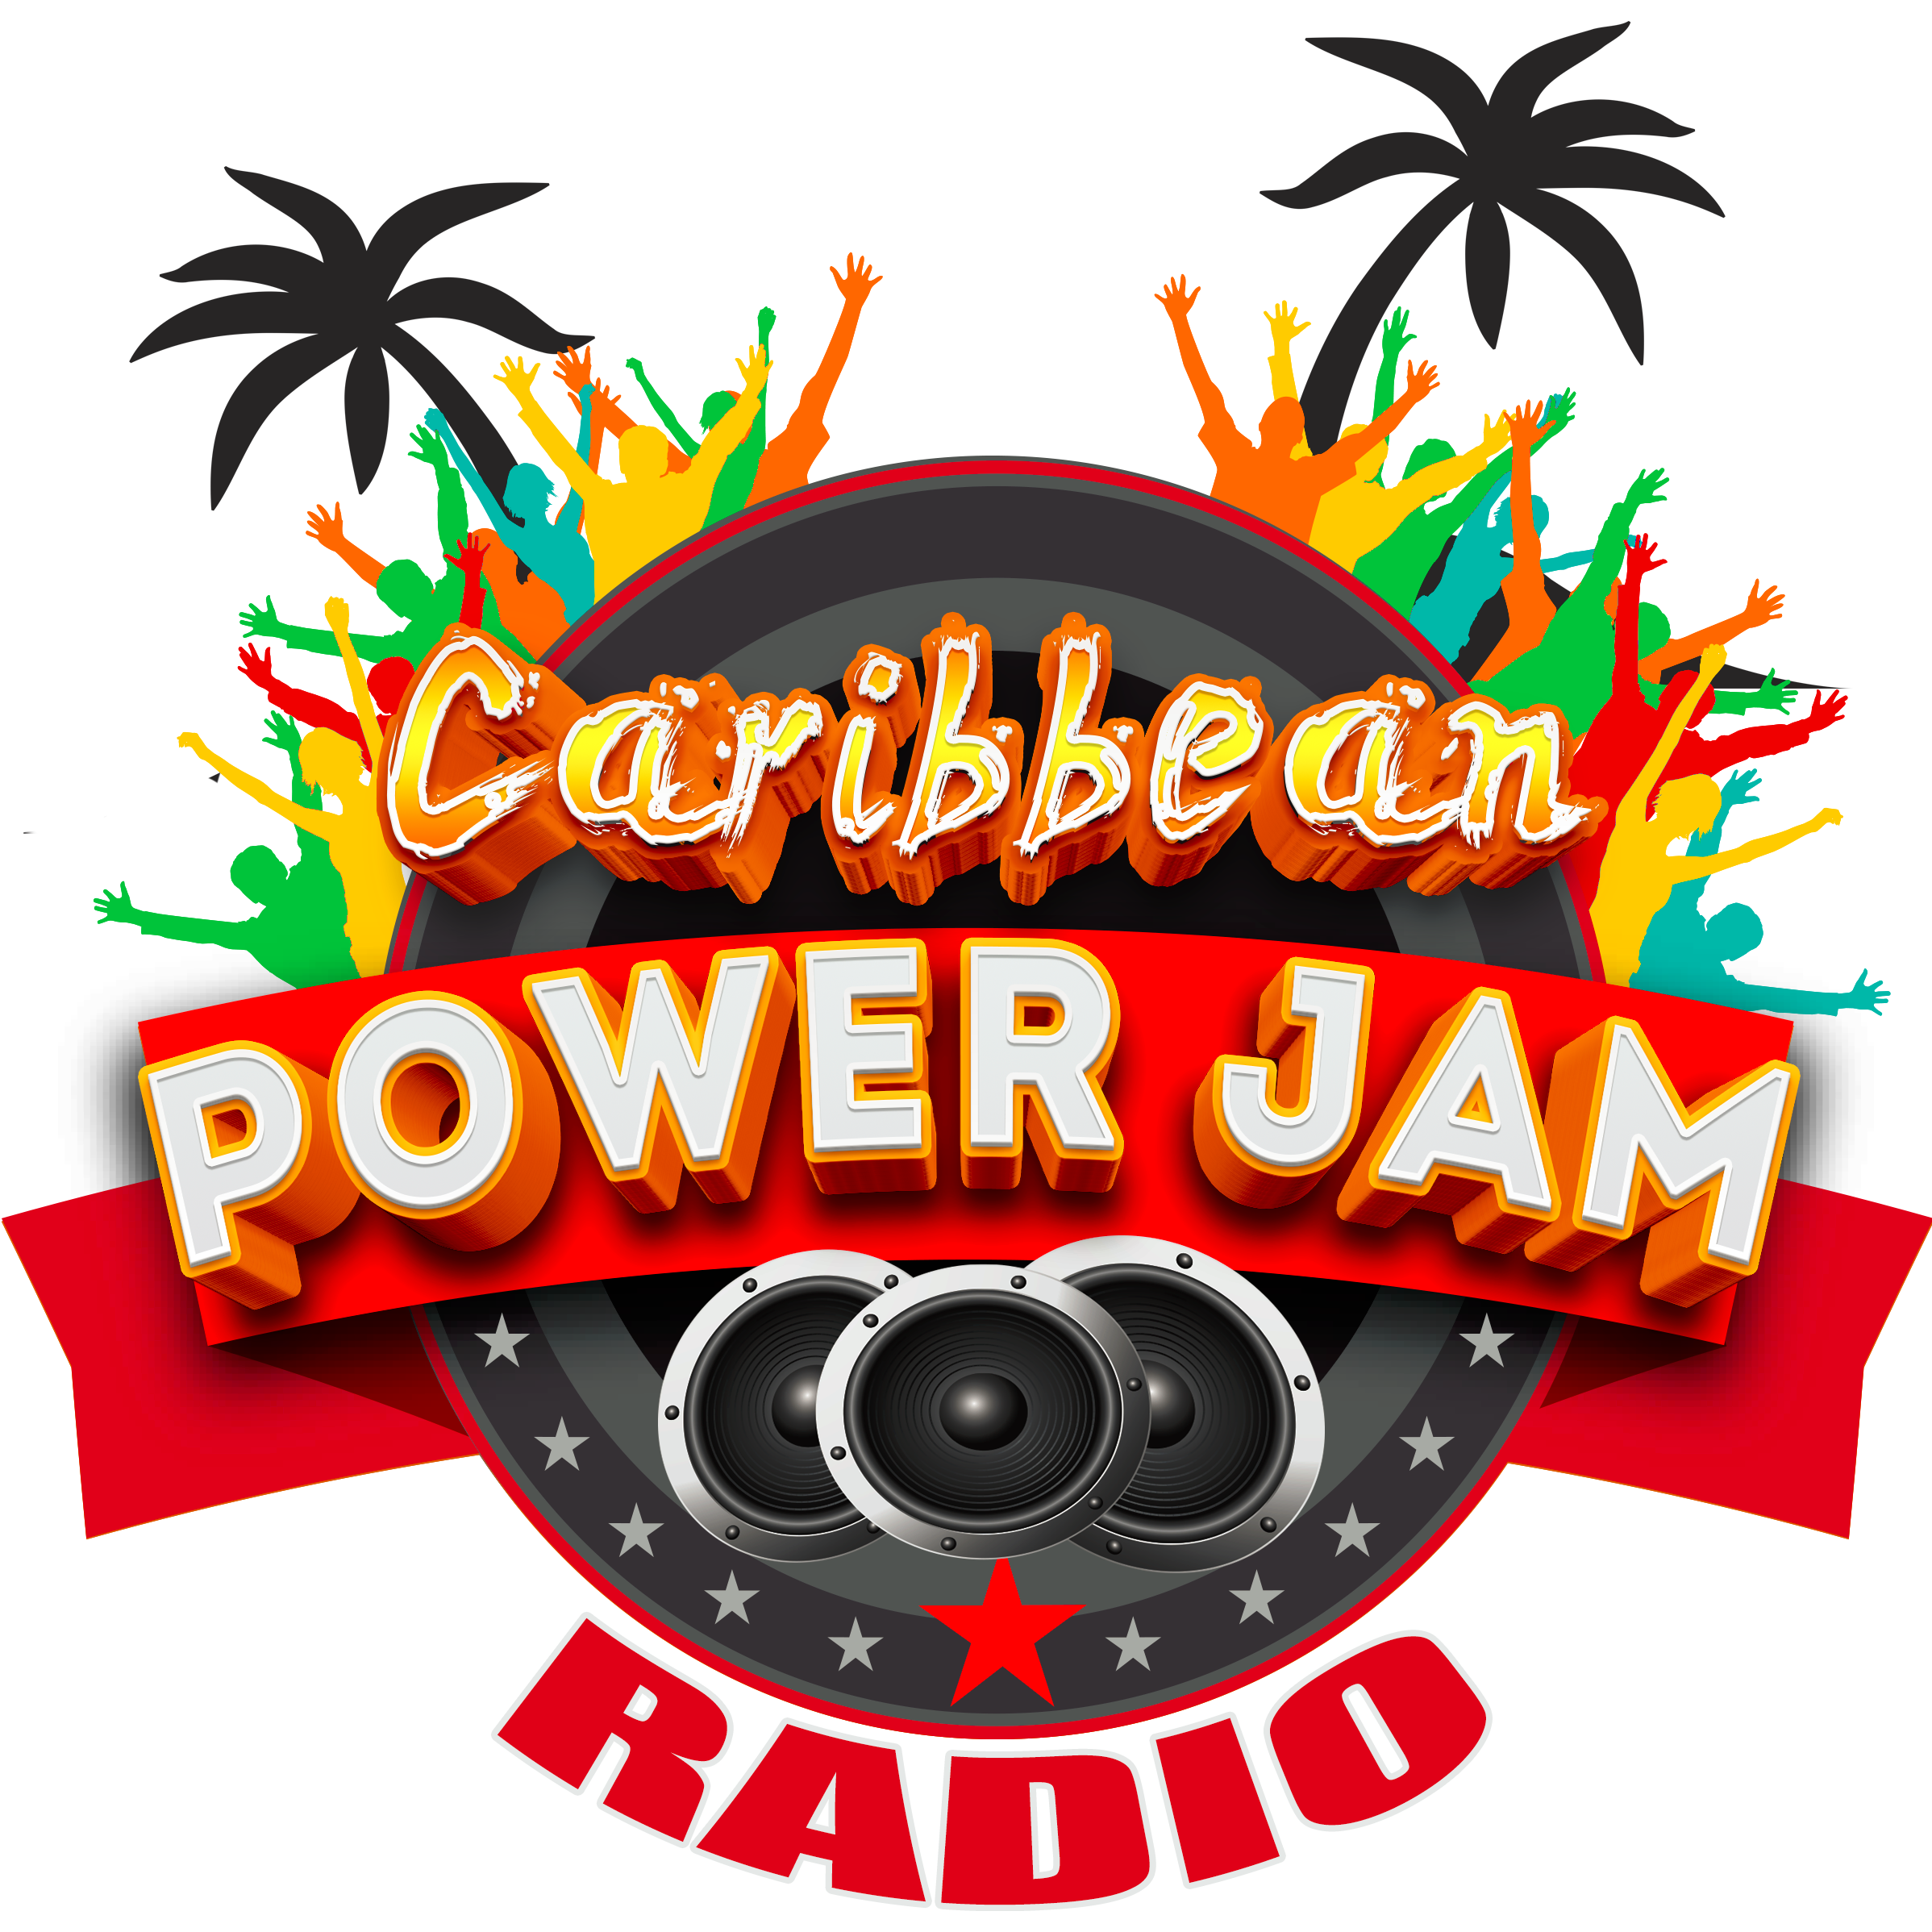 Online Caribbean Music Station | Caribbean Power Jam Radio